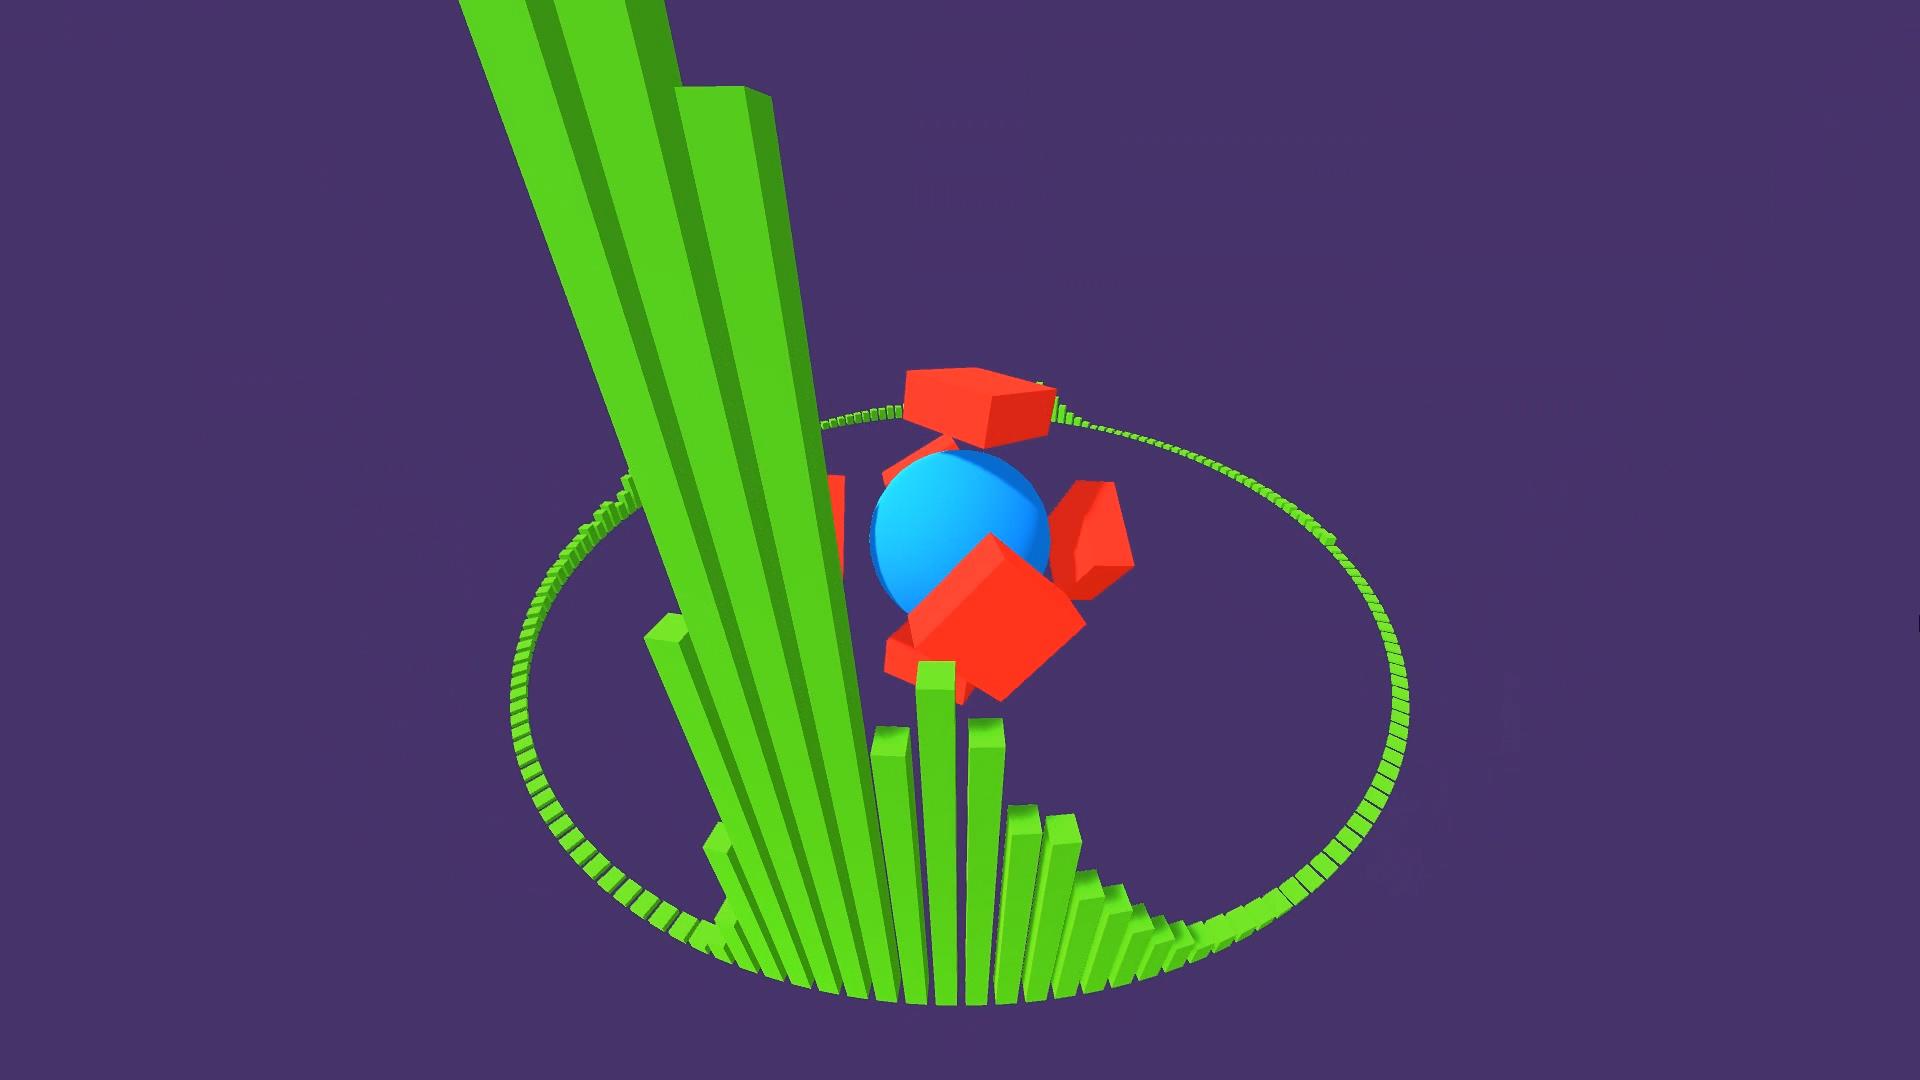 konsfik-procedural-audio-made-in-unity3d-autoplay-mode-screenshot-6